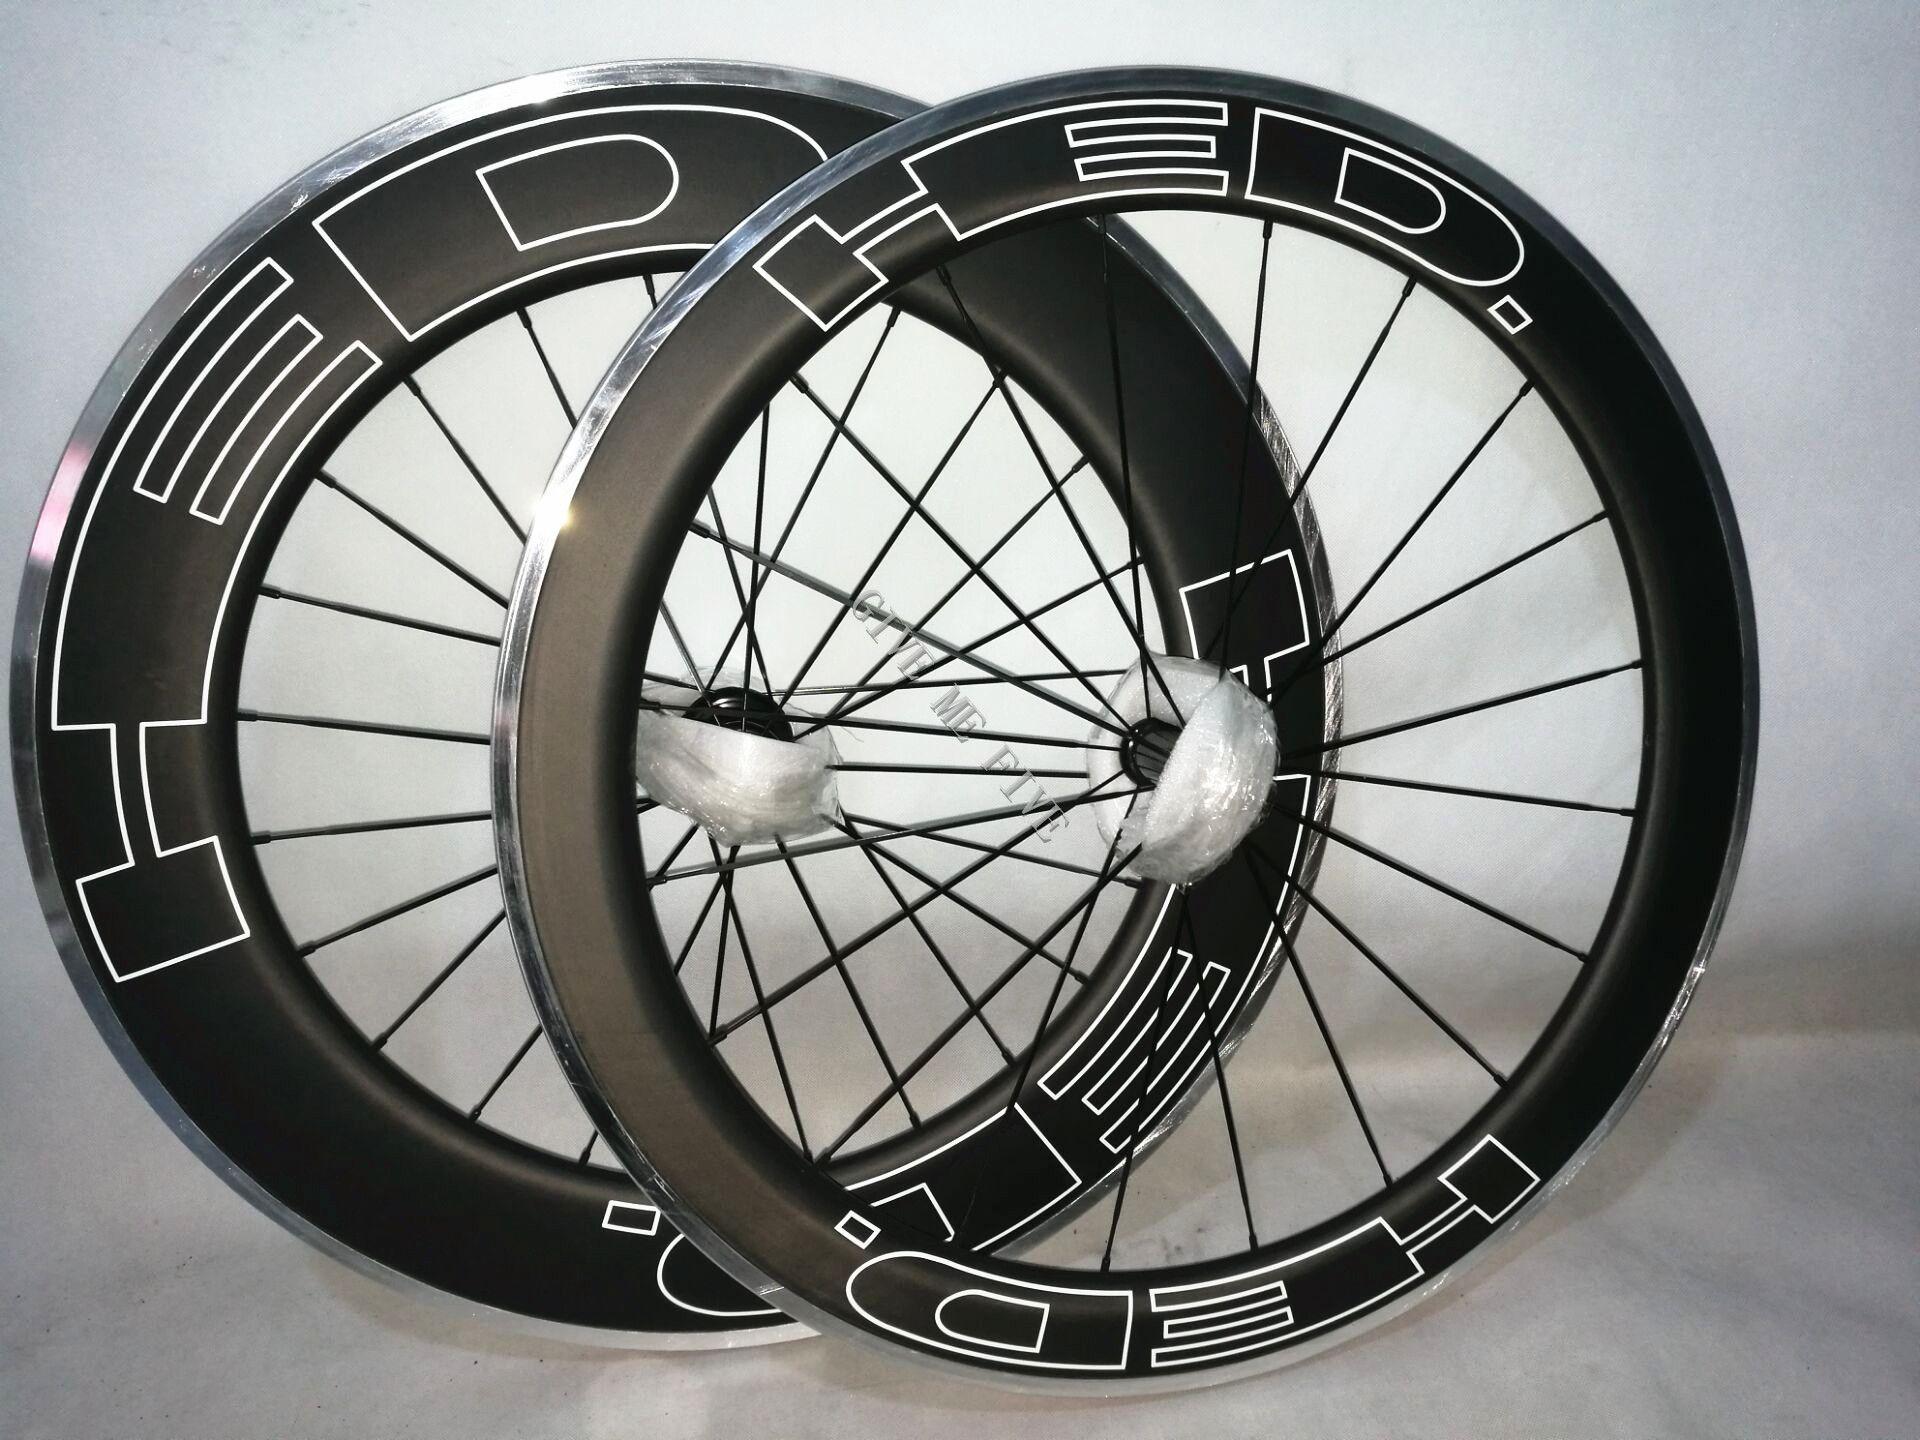 700c Full Carbon Fiber Road Wheel Set Clincher 88mm Front And Rear